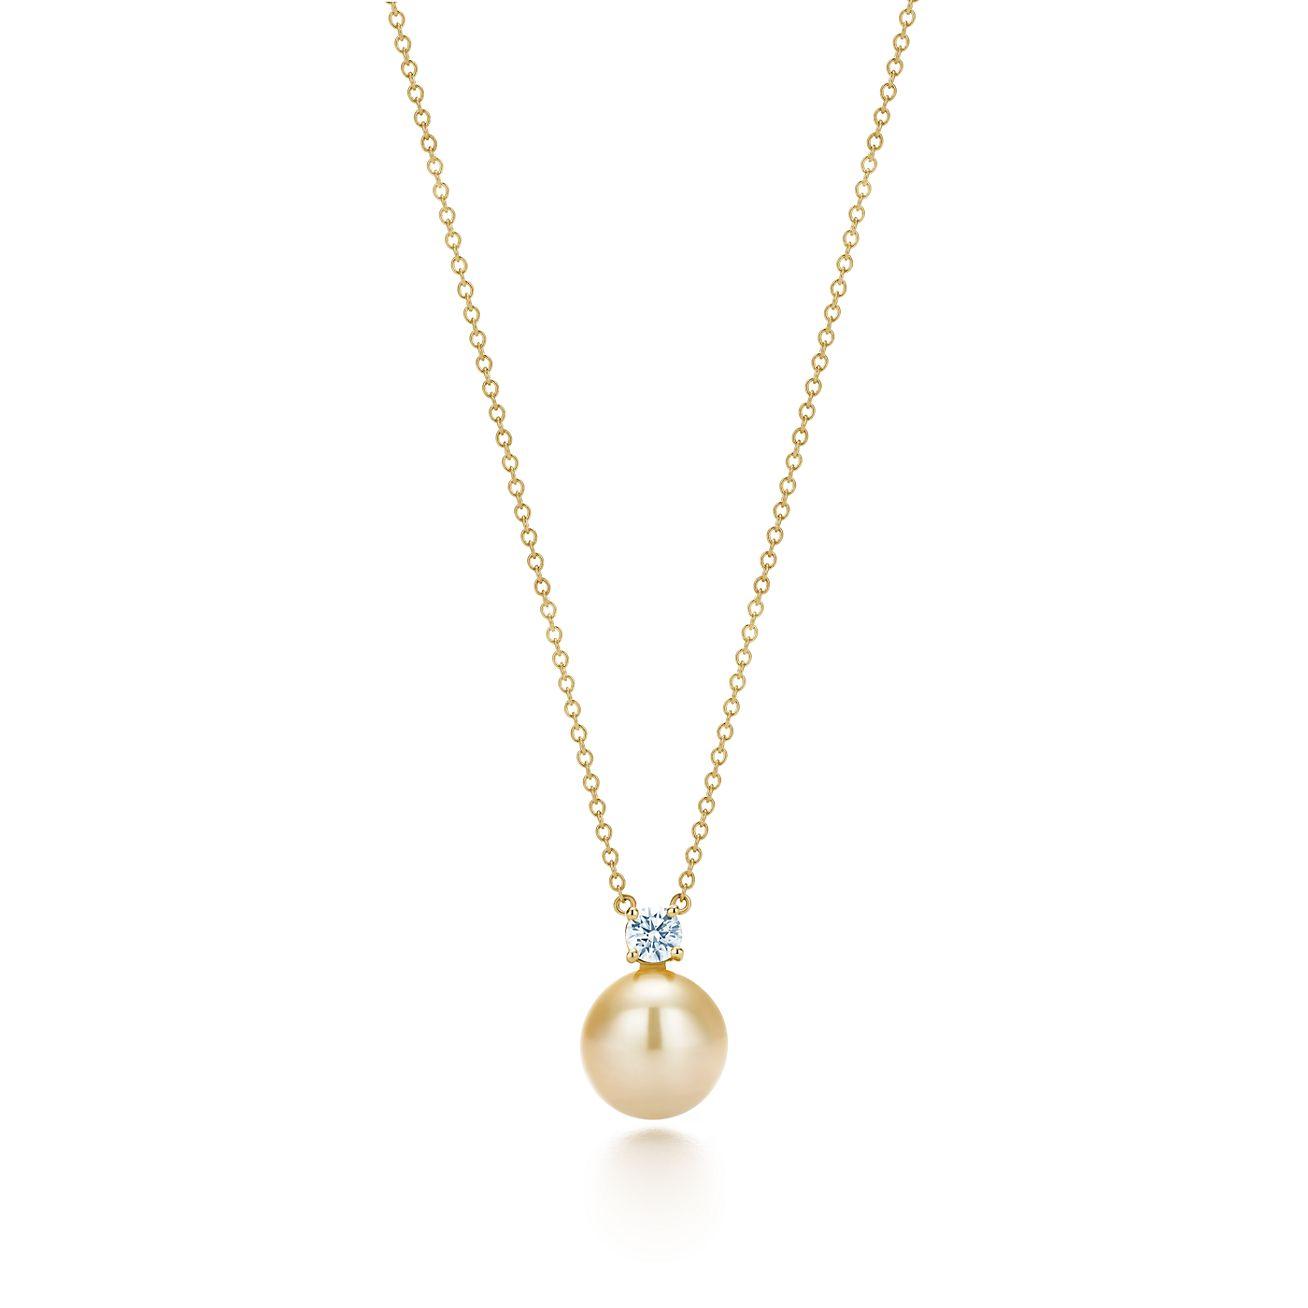 Tiffany South Sea pearl pendant in 18k gold with diamonds ...